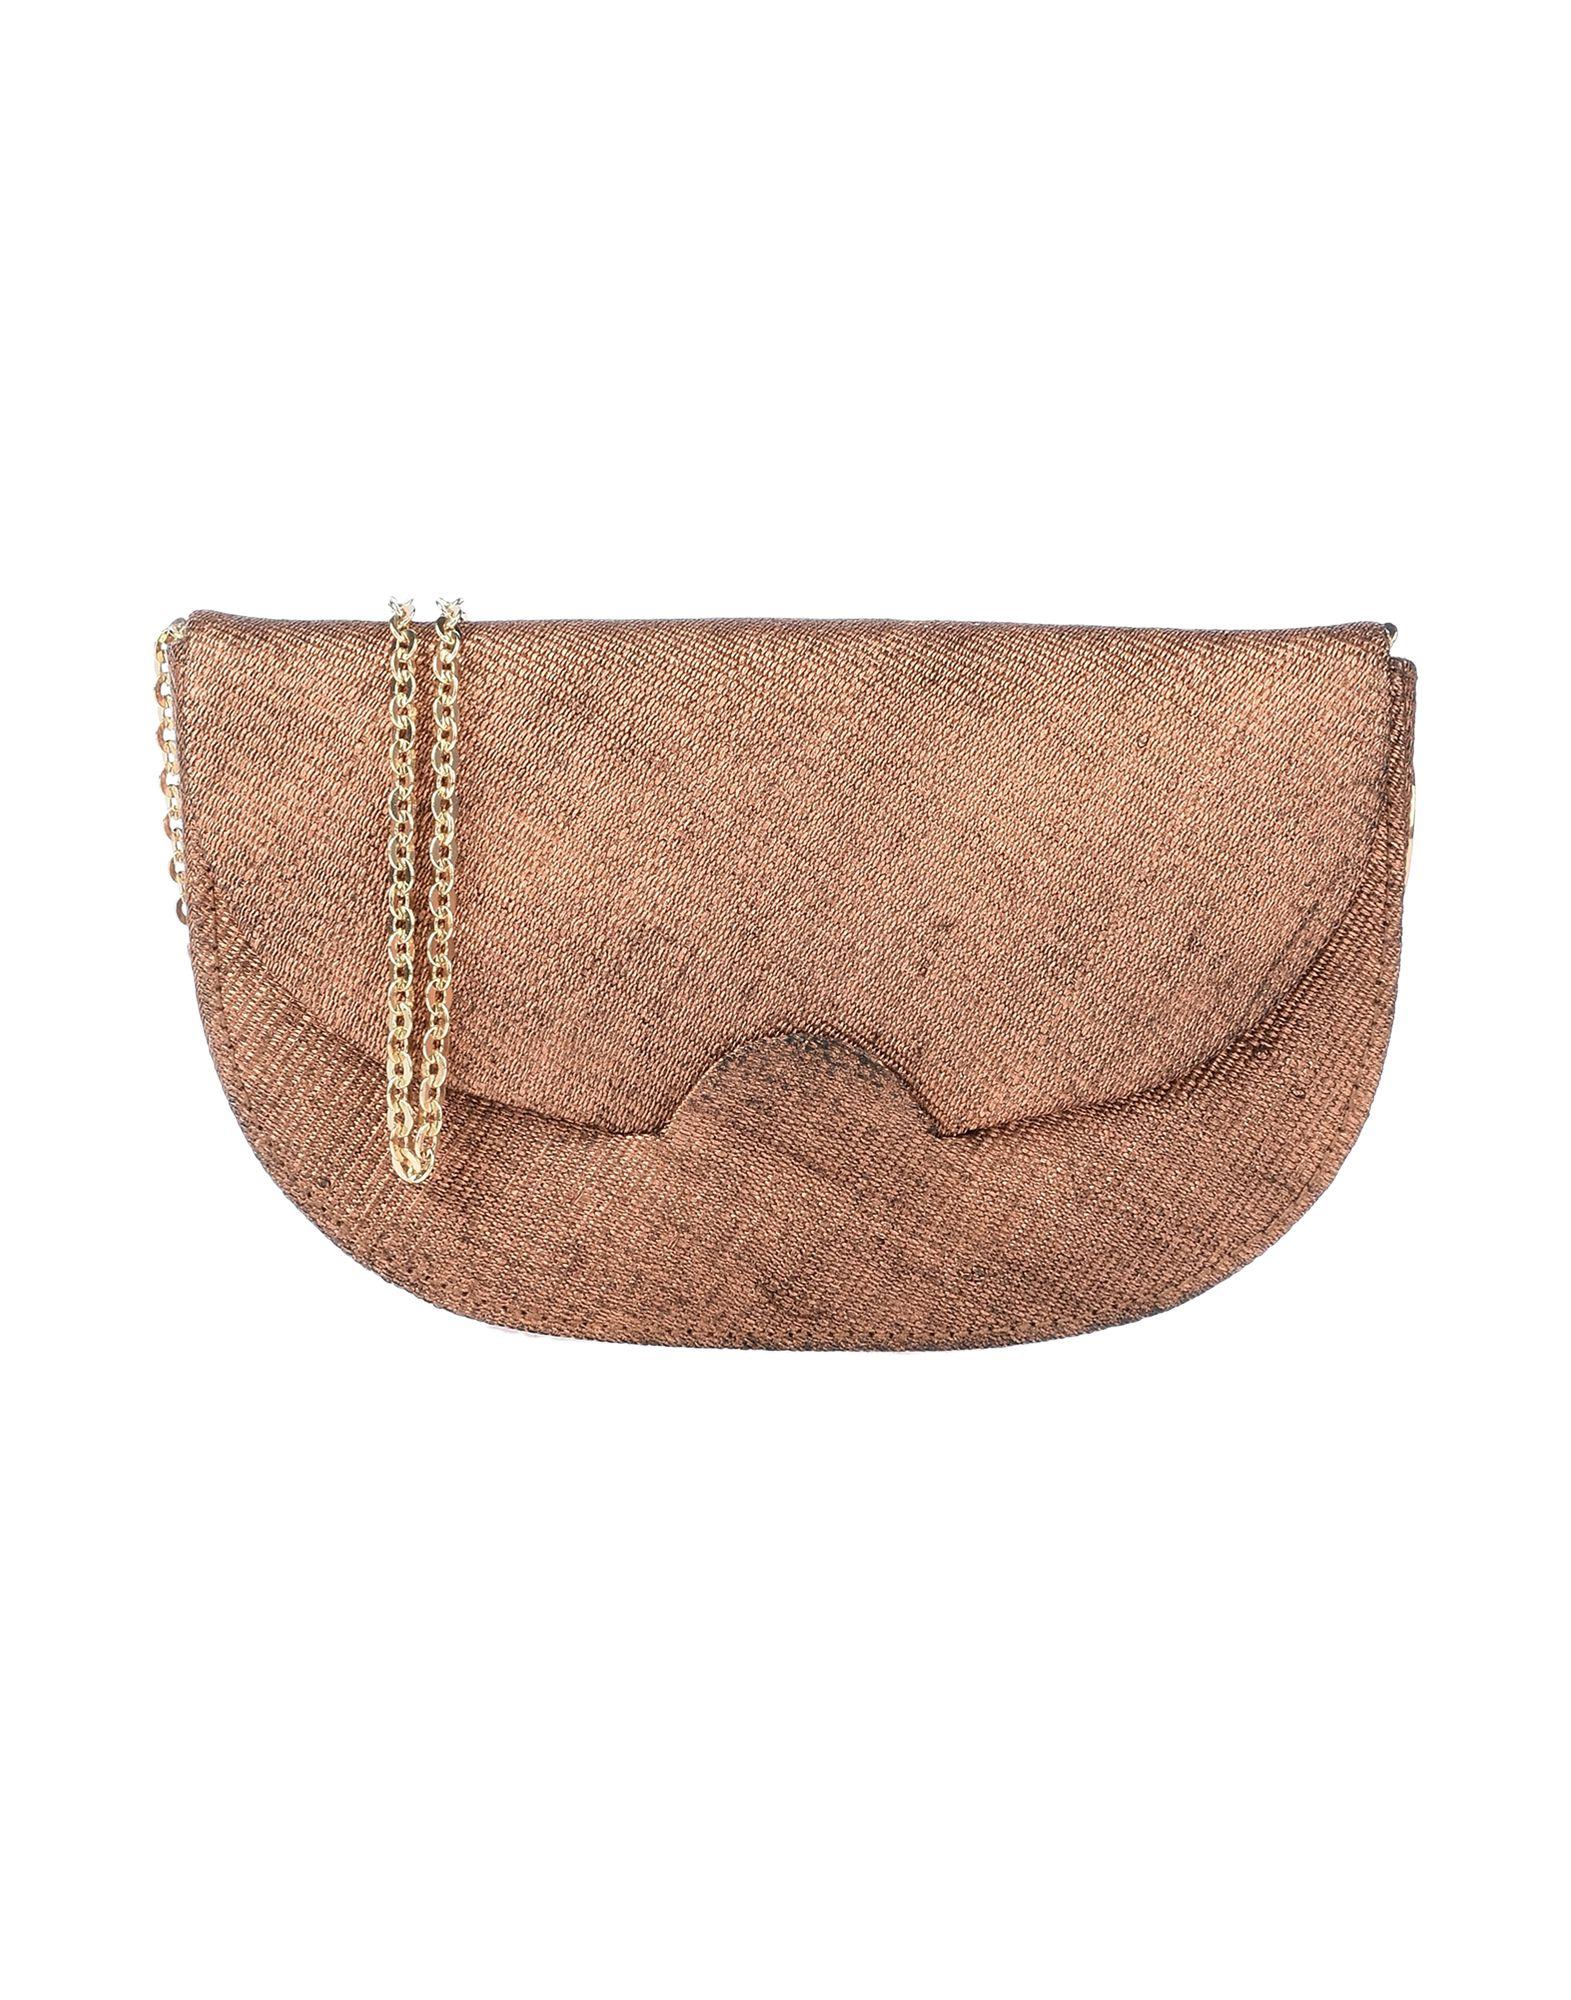 INTROPIA Сумка через плечо сумка через плечо anais gvani croco ag 1471 350161